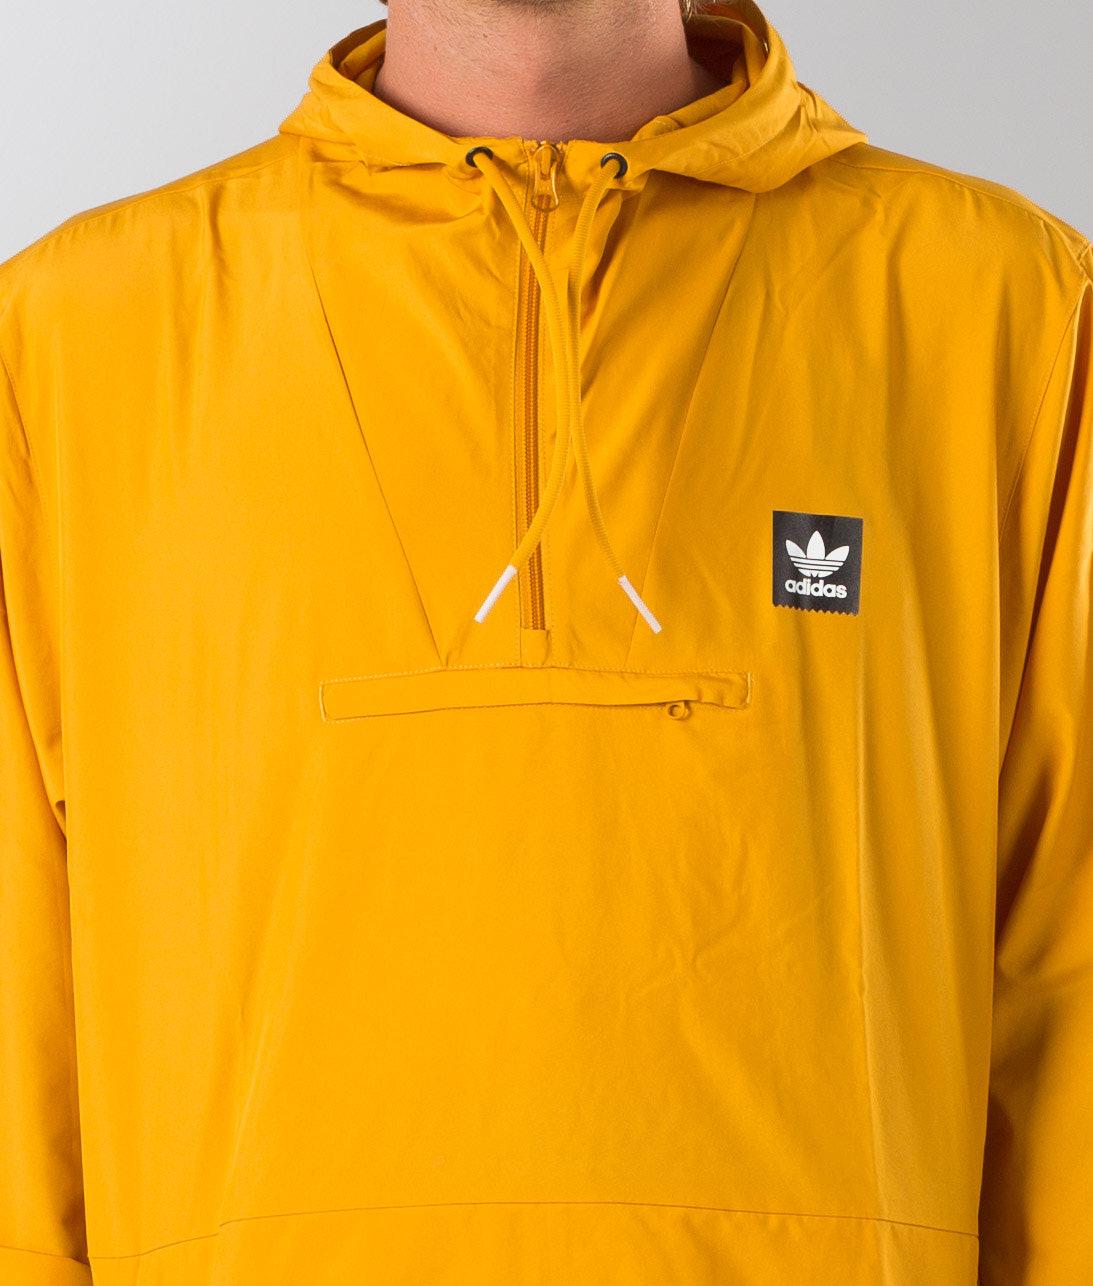 cbf19c4edfe9 Adidas Skateboarding Hip Jacket Tactile Yellow - Ridestore.com